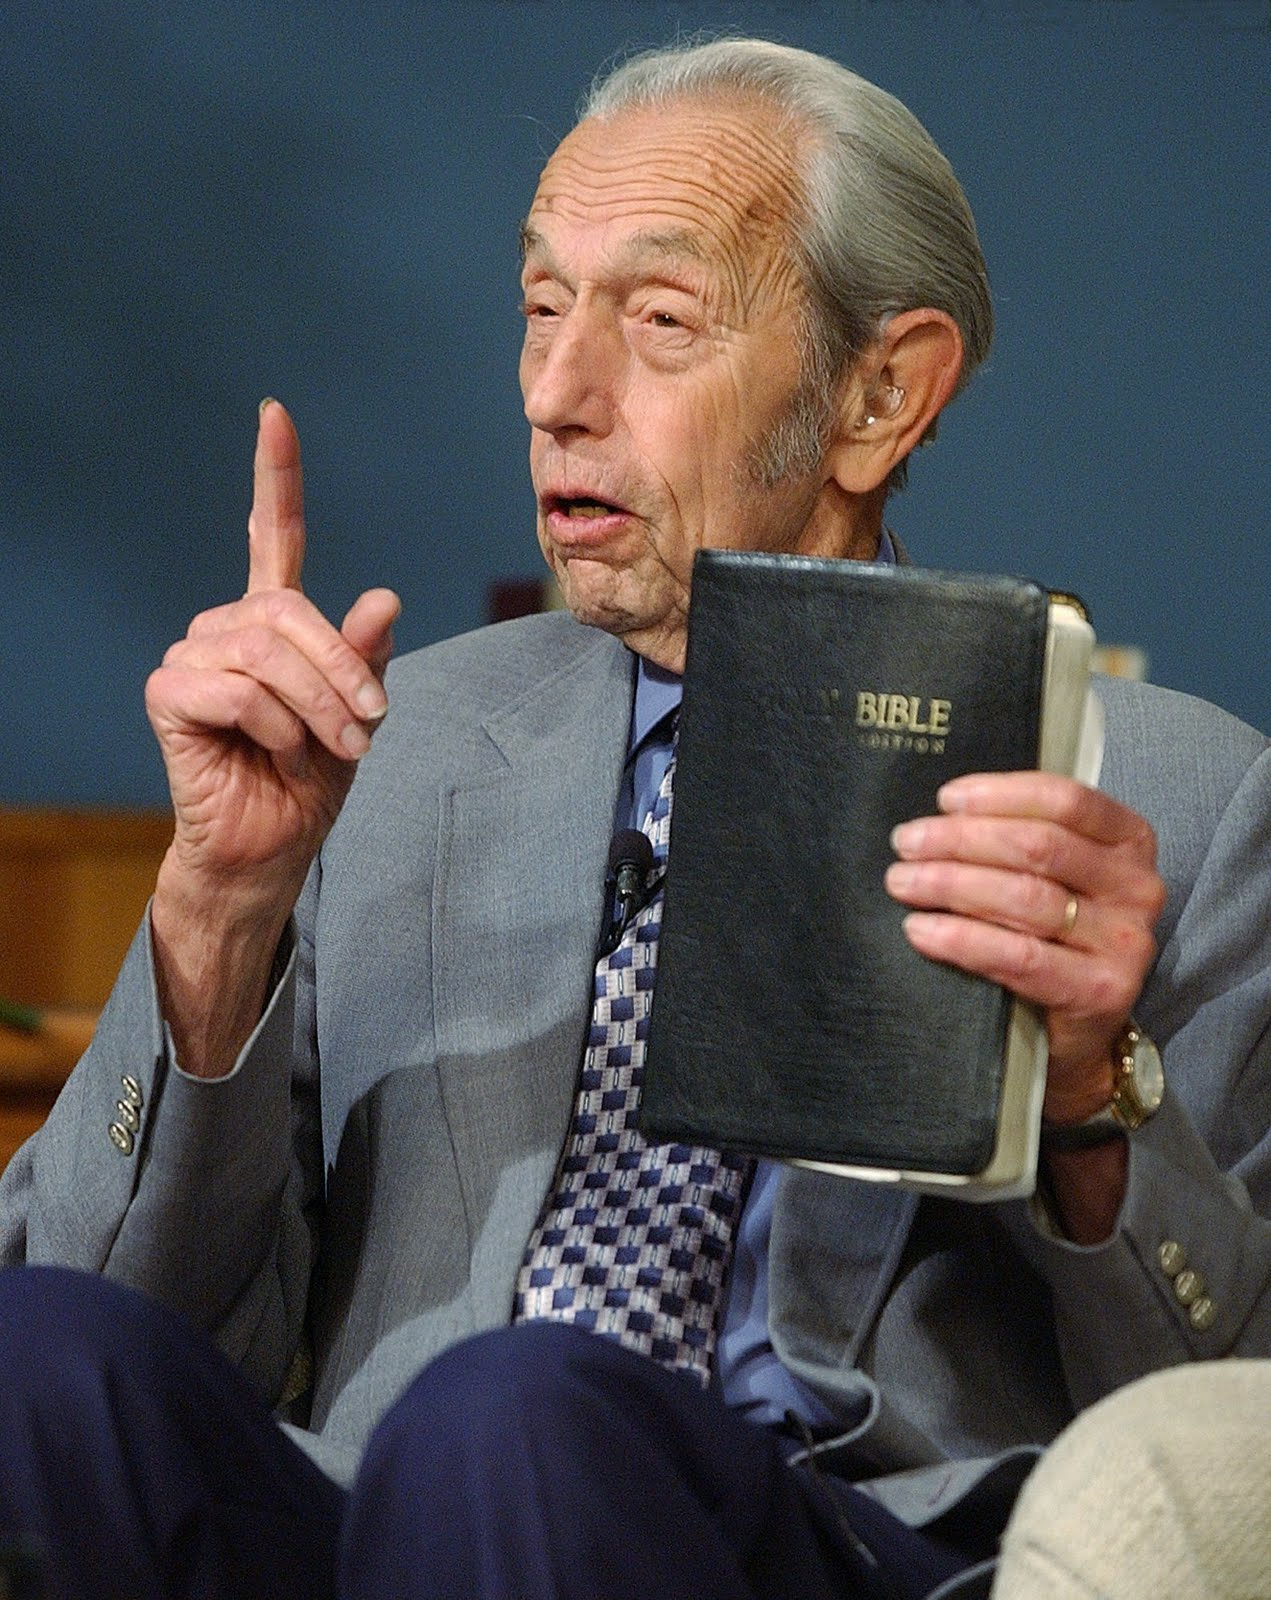 http://4.bp.blogspot.com/-L65GmpF0-1Y/TfhGTHyNq5I/AAAAAAAABQY/0YRoVk523Xk/s1600/Harold+Camping++predicador.jpg